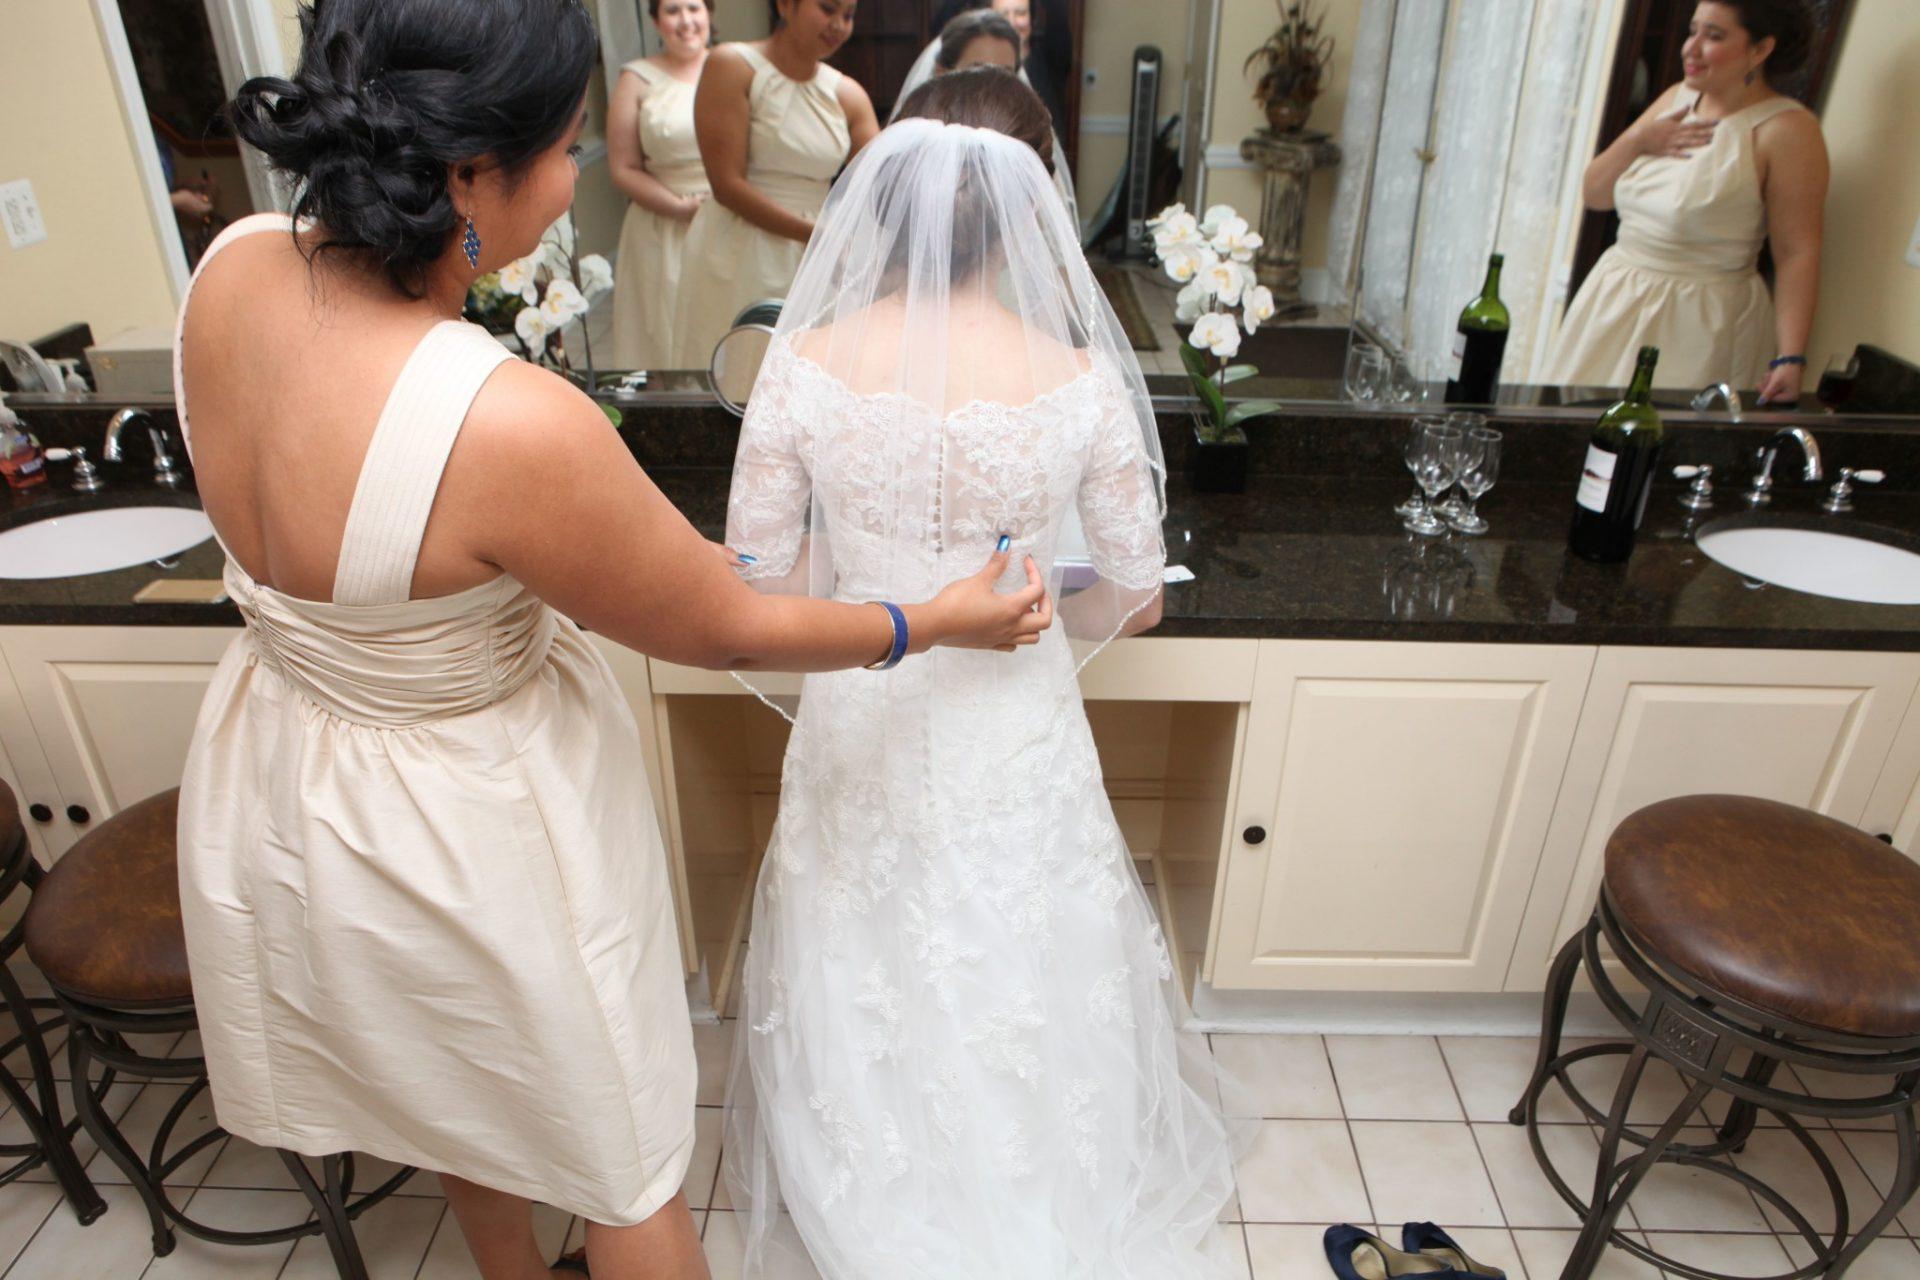 Bride prepares for her wedding in the large bride's room at Morningside Inn